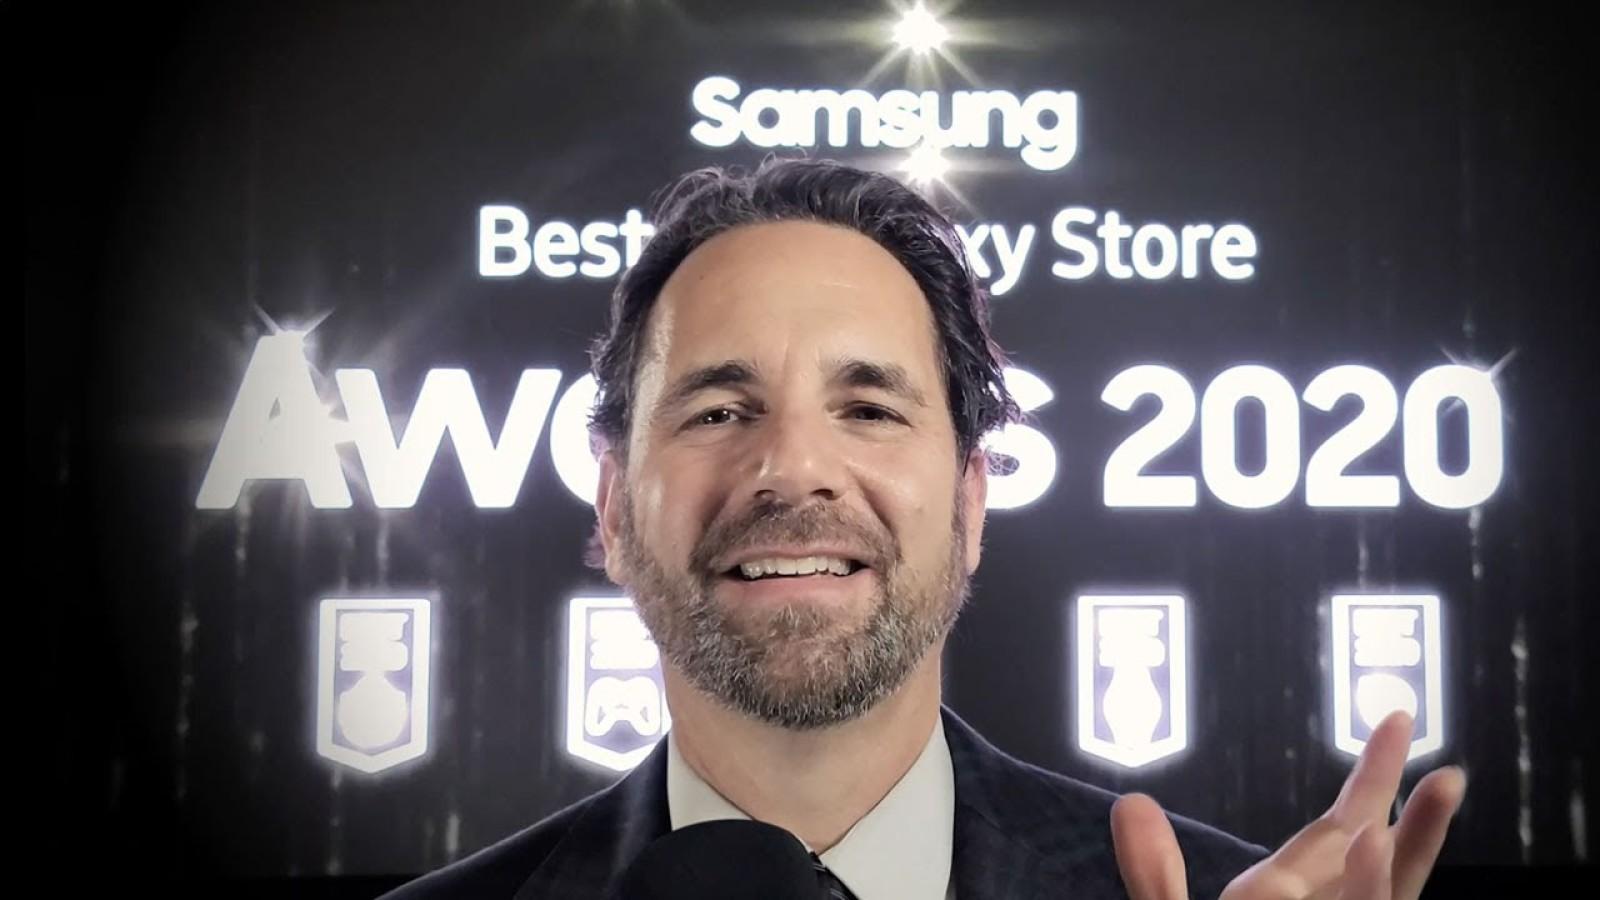 Samsung Best of Galaxy Store Awards